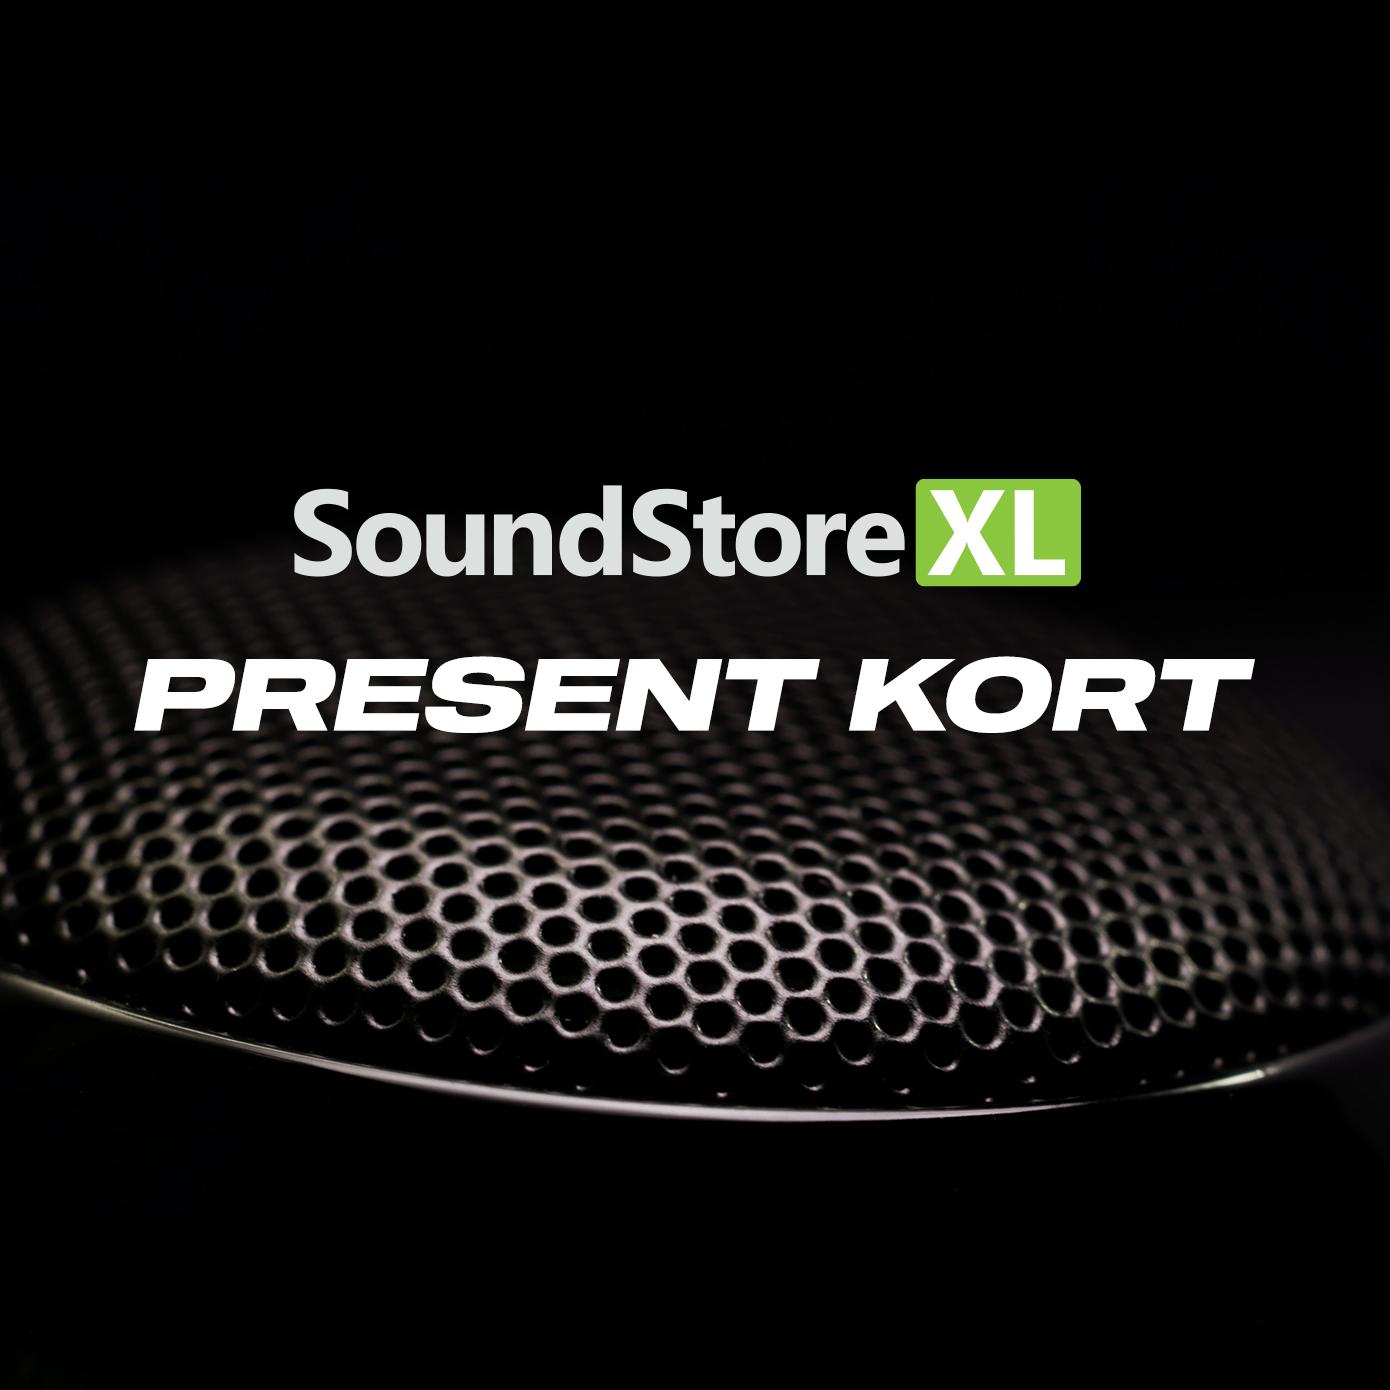 SoundStoreXL Presentkort (mejl)